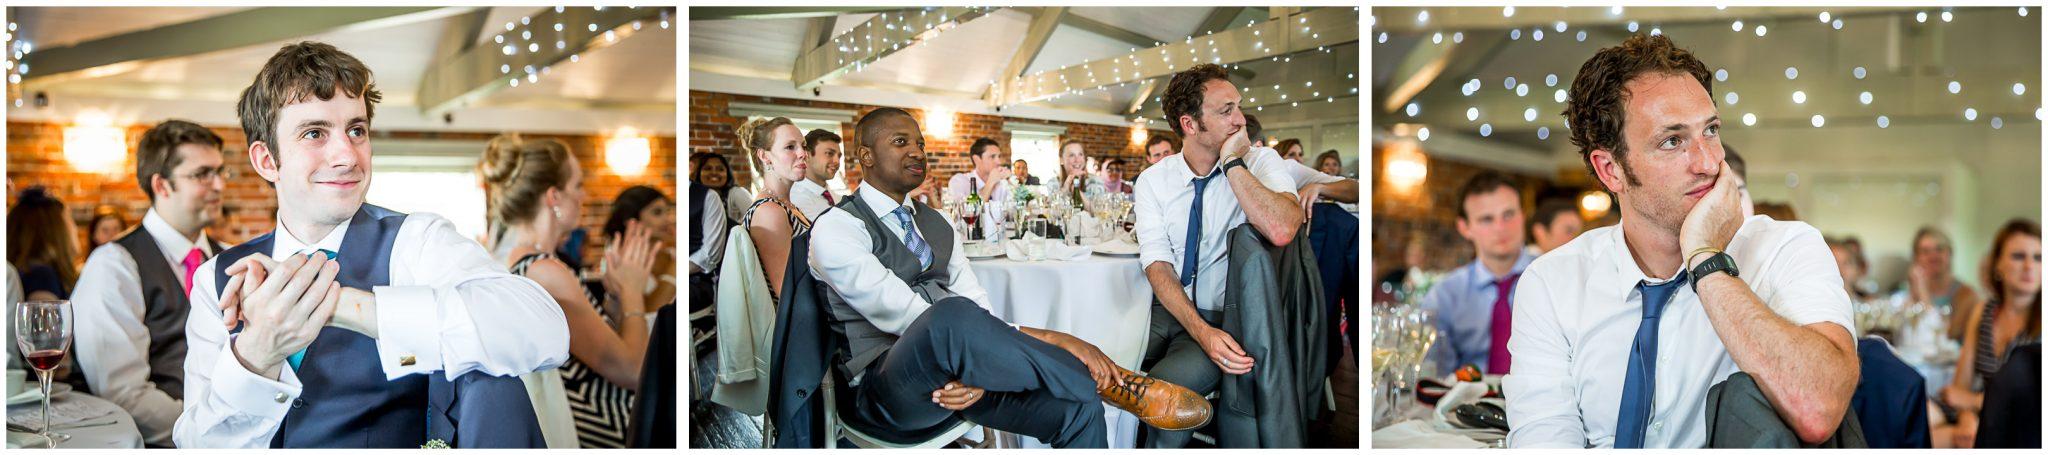 Sopley Mill Summer wedding watching the speeches